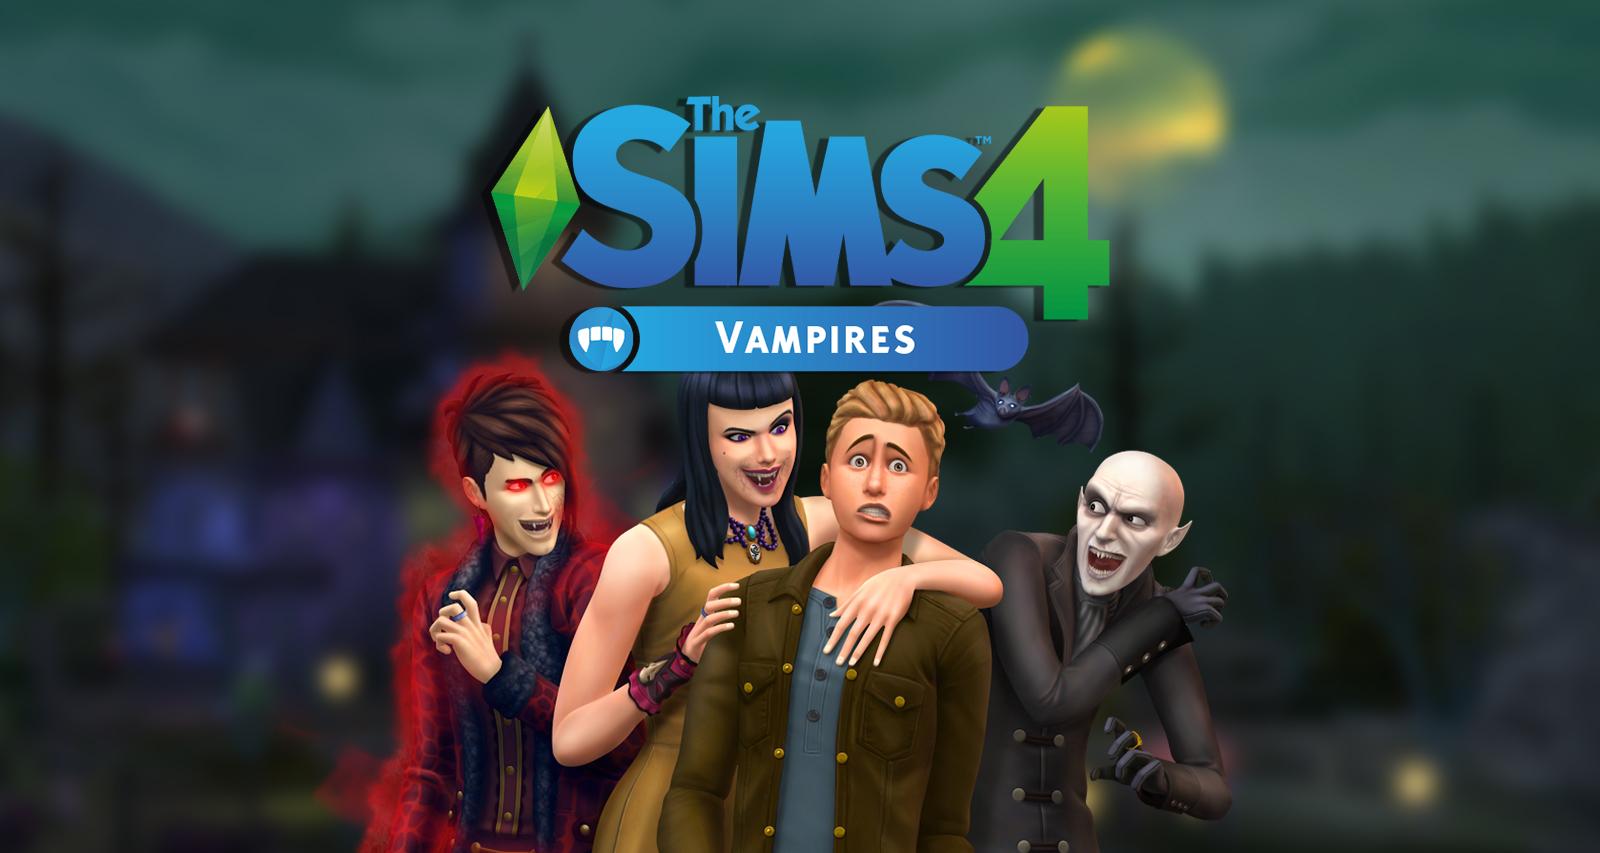 THE SIMS 4 VAMPIROS+INFANTES EDITION PC FULL ESPAÑOL 2017